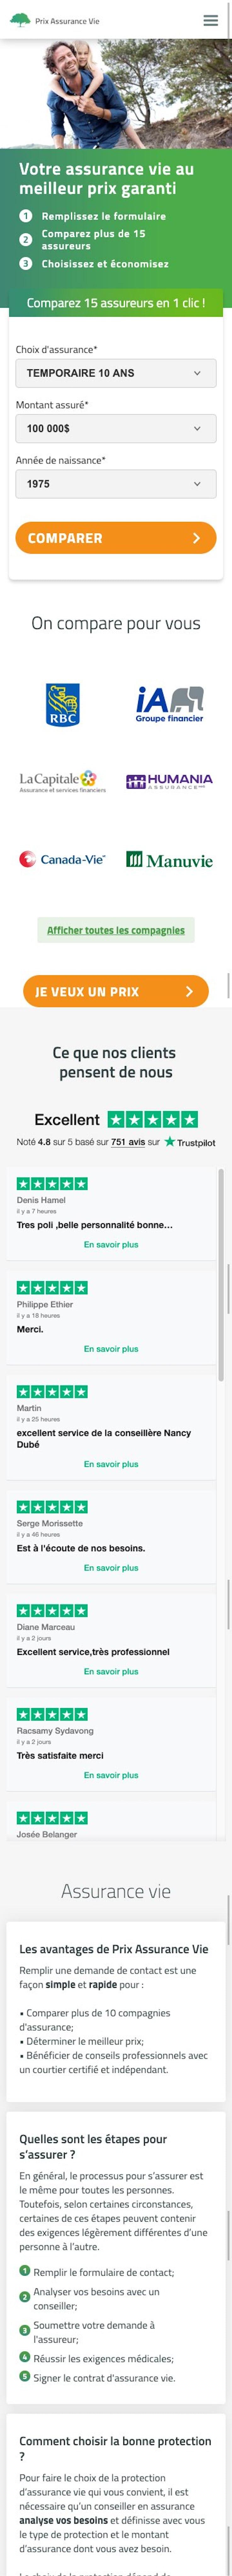 webflow project 3 - Prix Assurance Vie